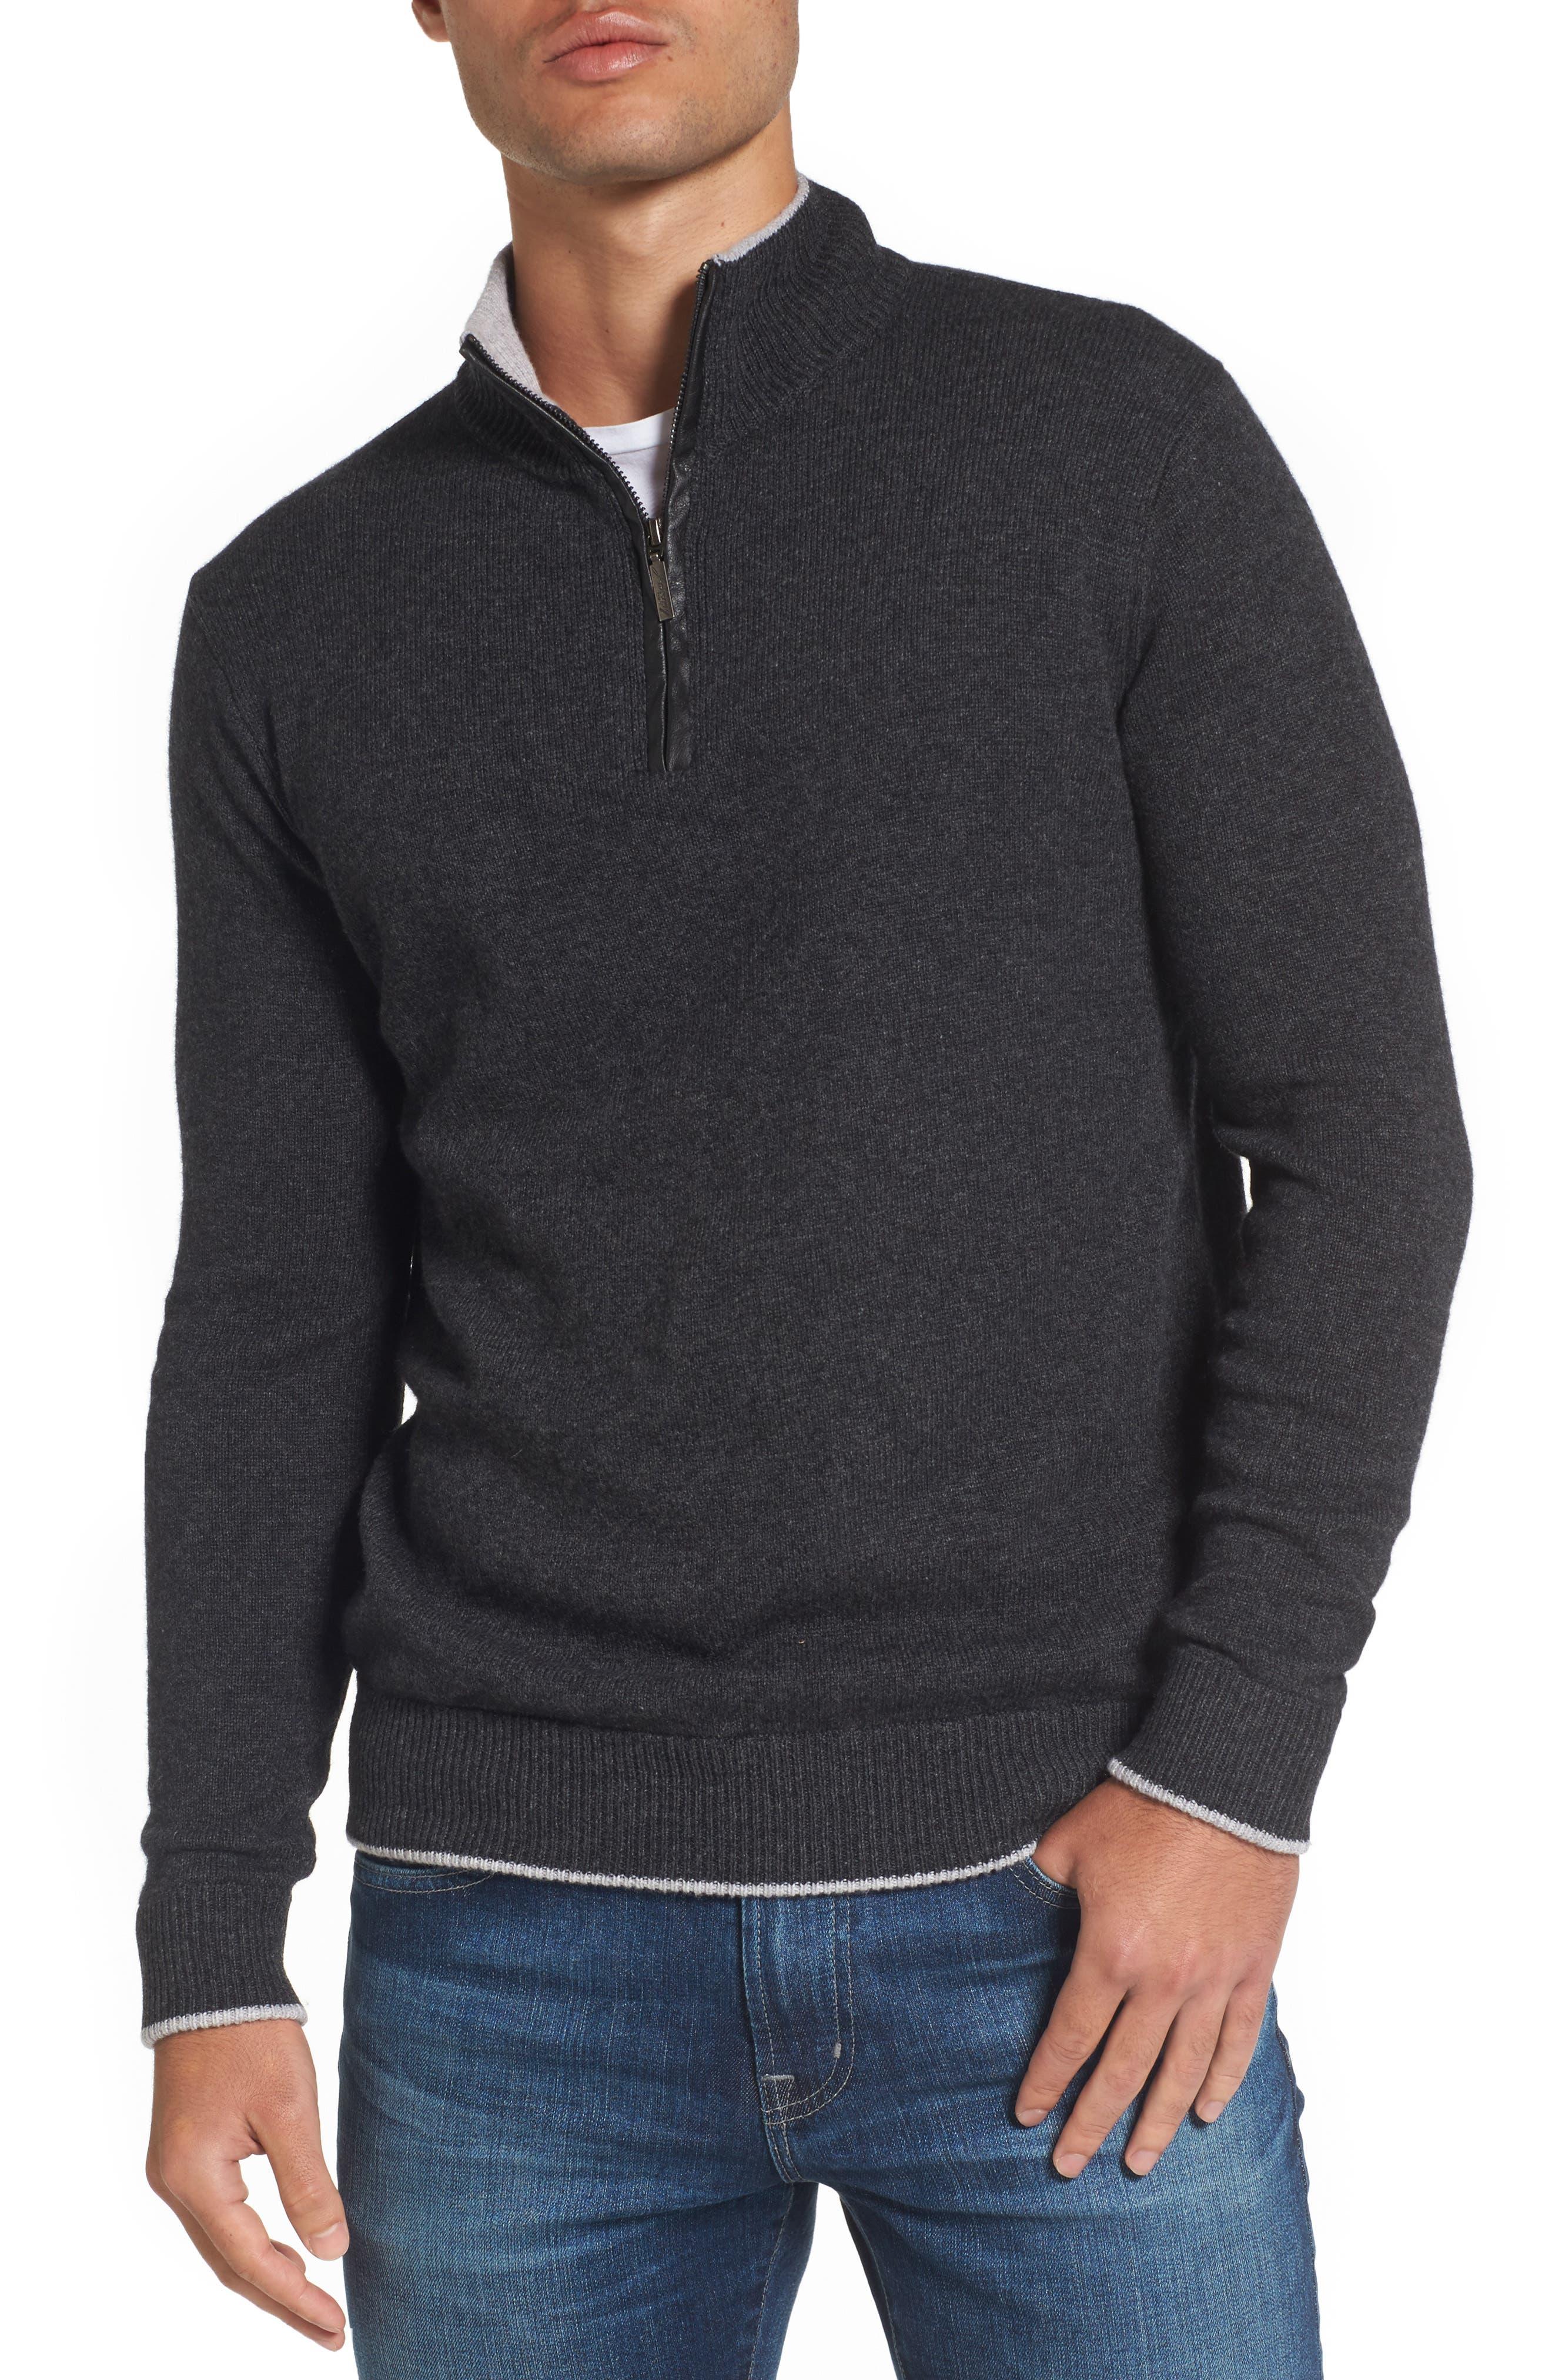 Wool Blend Quarter Zip Sweater,                             Main thumbnail 1, color,                             025